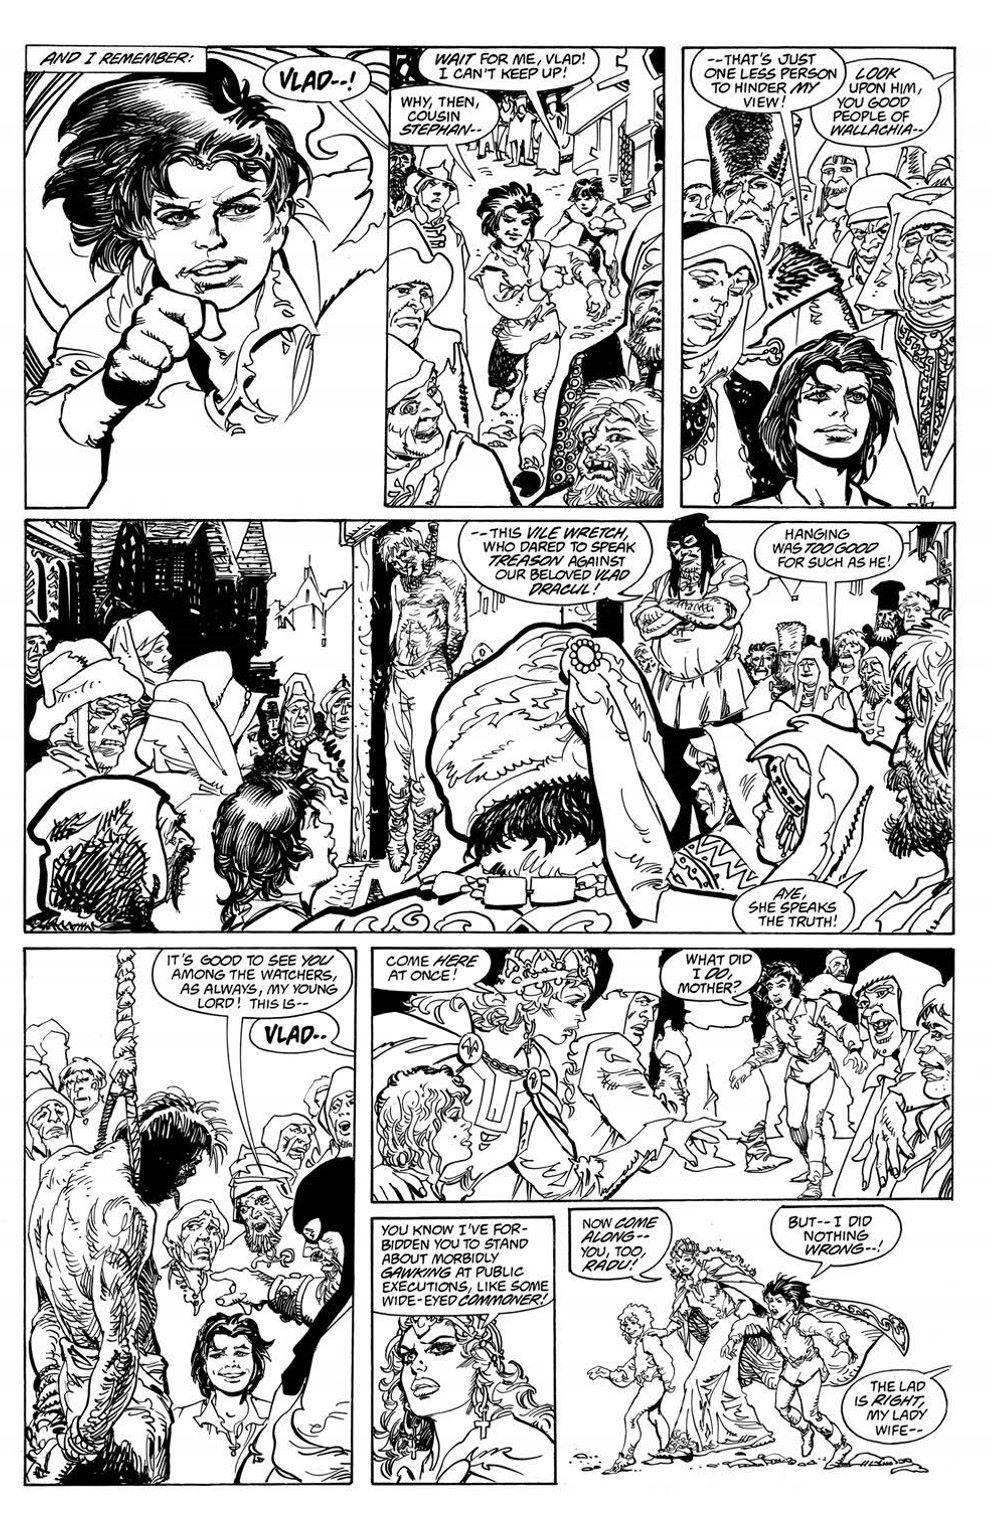 VladTheImpaler_TPB_pr-6 ComicList Previews: DRACULA VLAD THE IMPALER GN